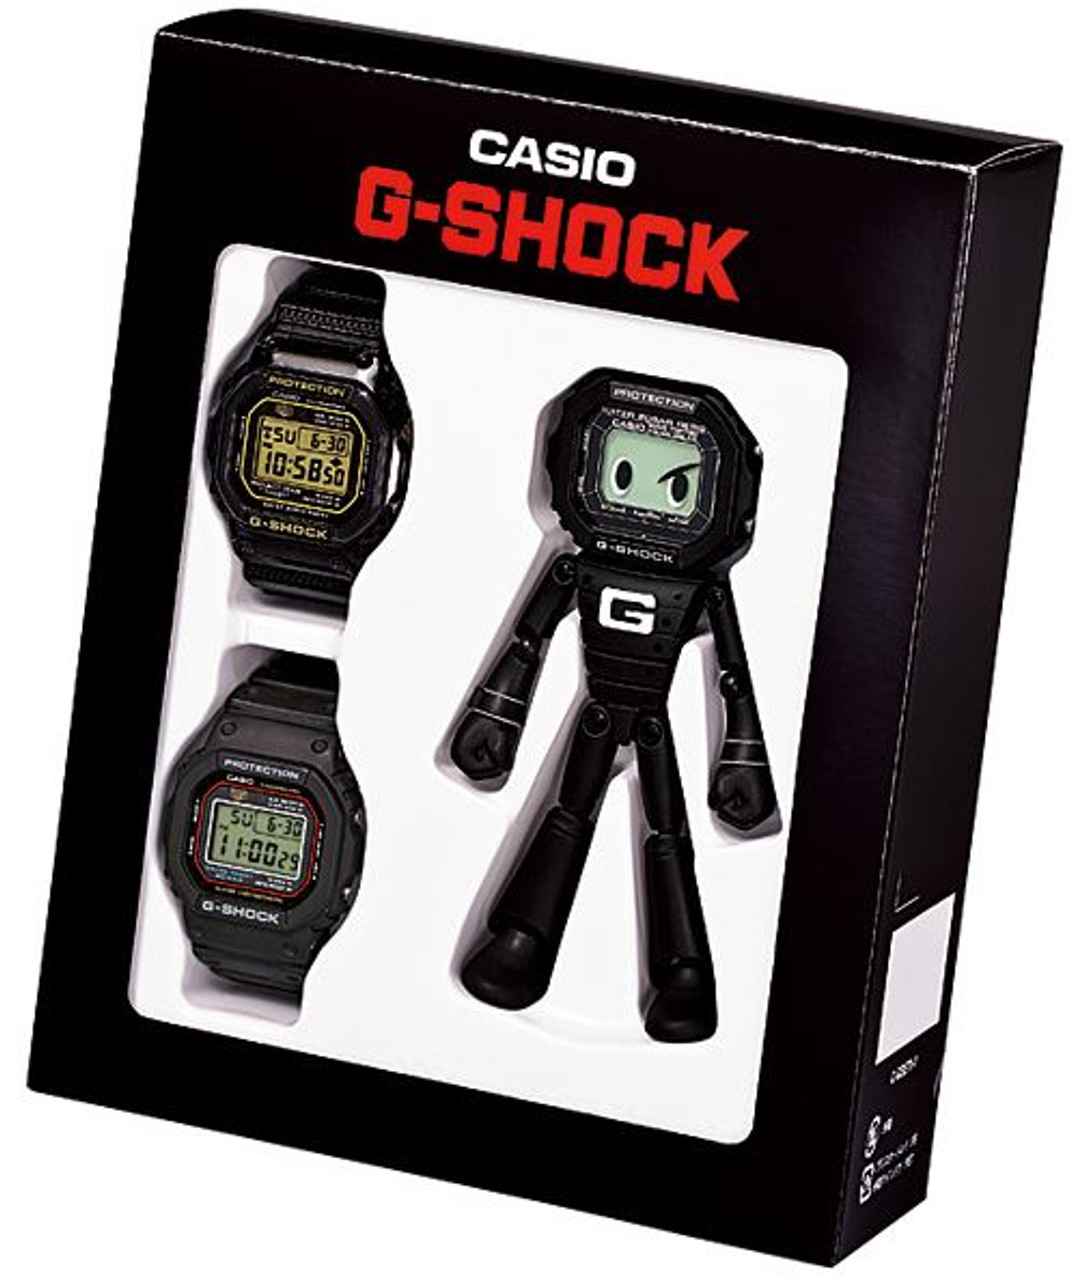 Casio G-Shock Box 30th Anniversary Limited Watch